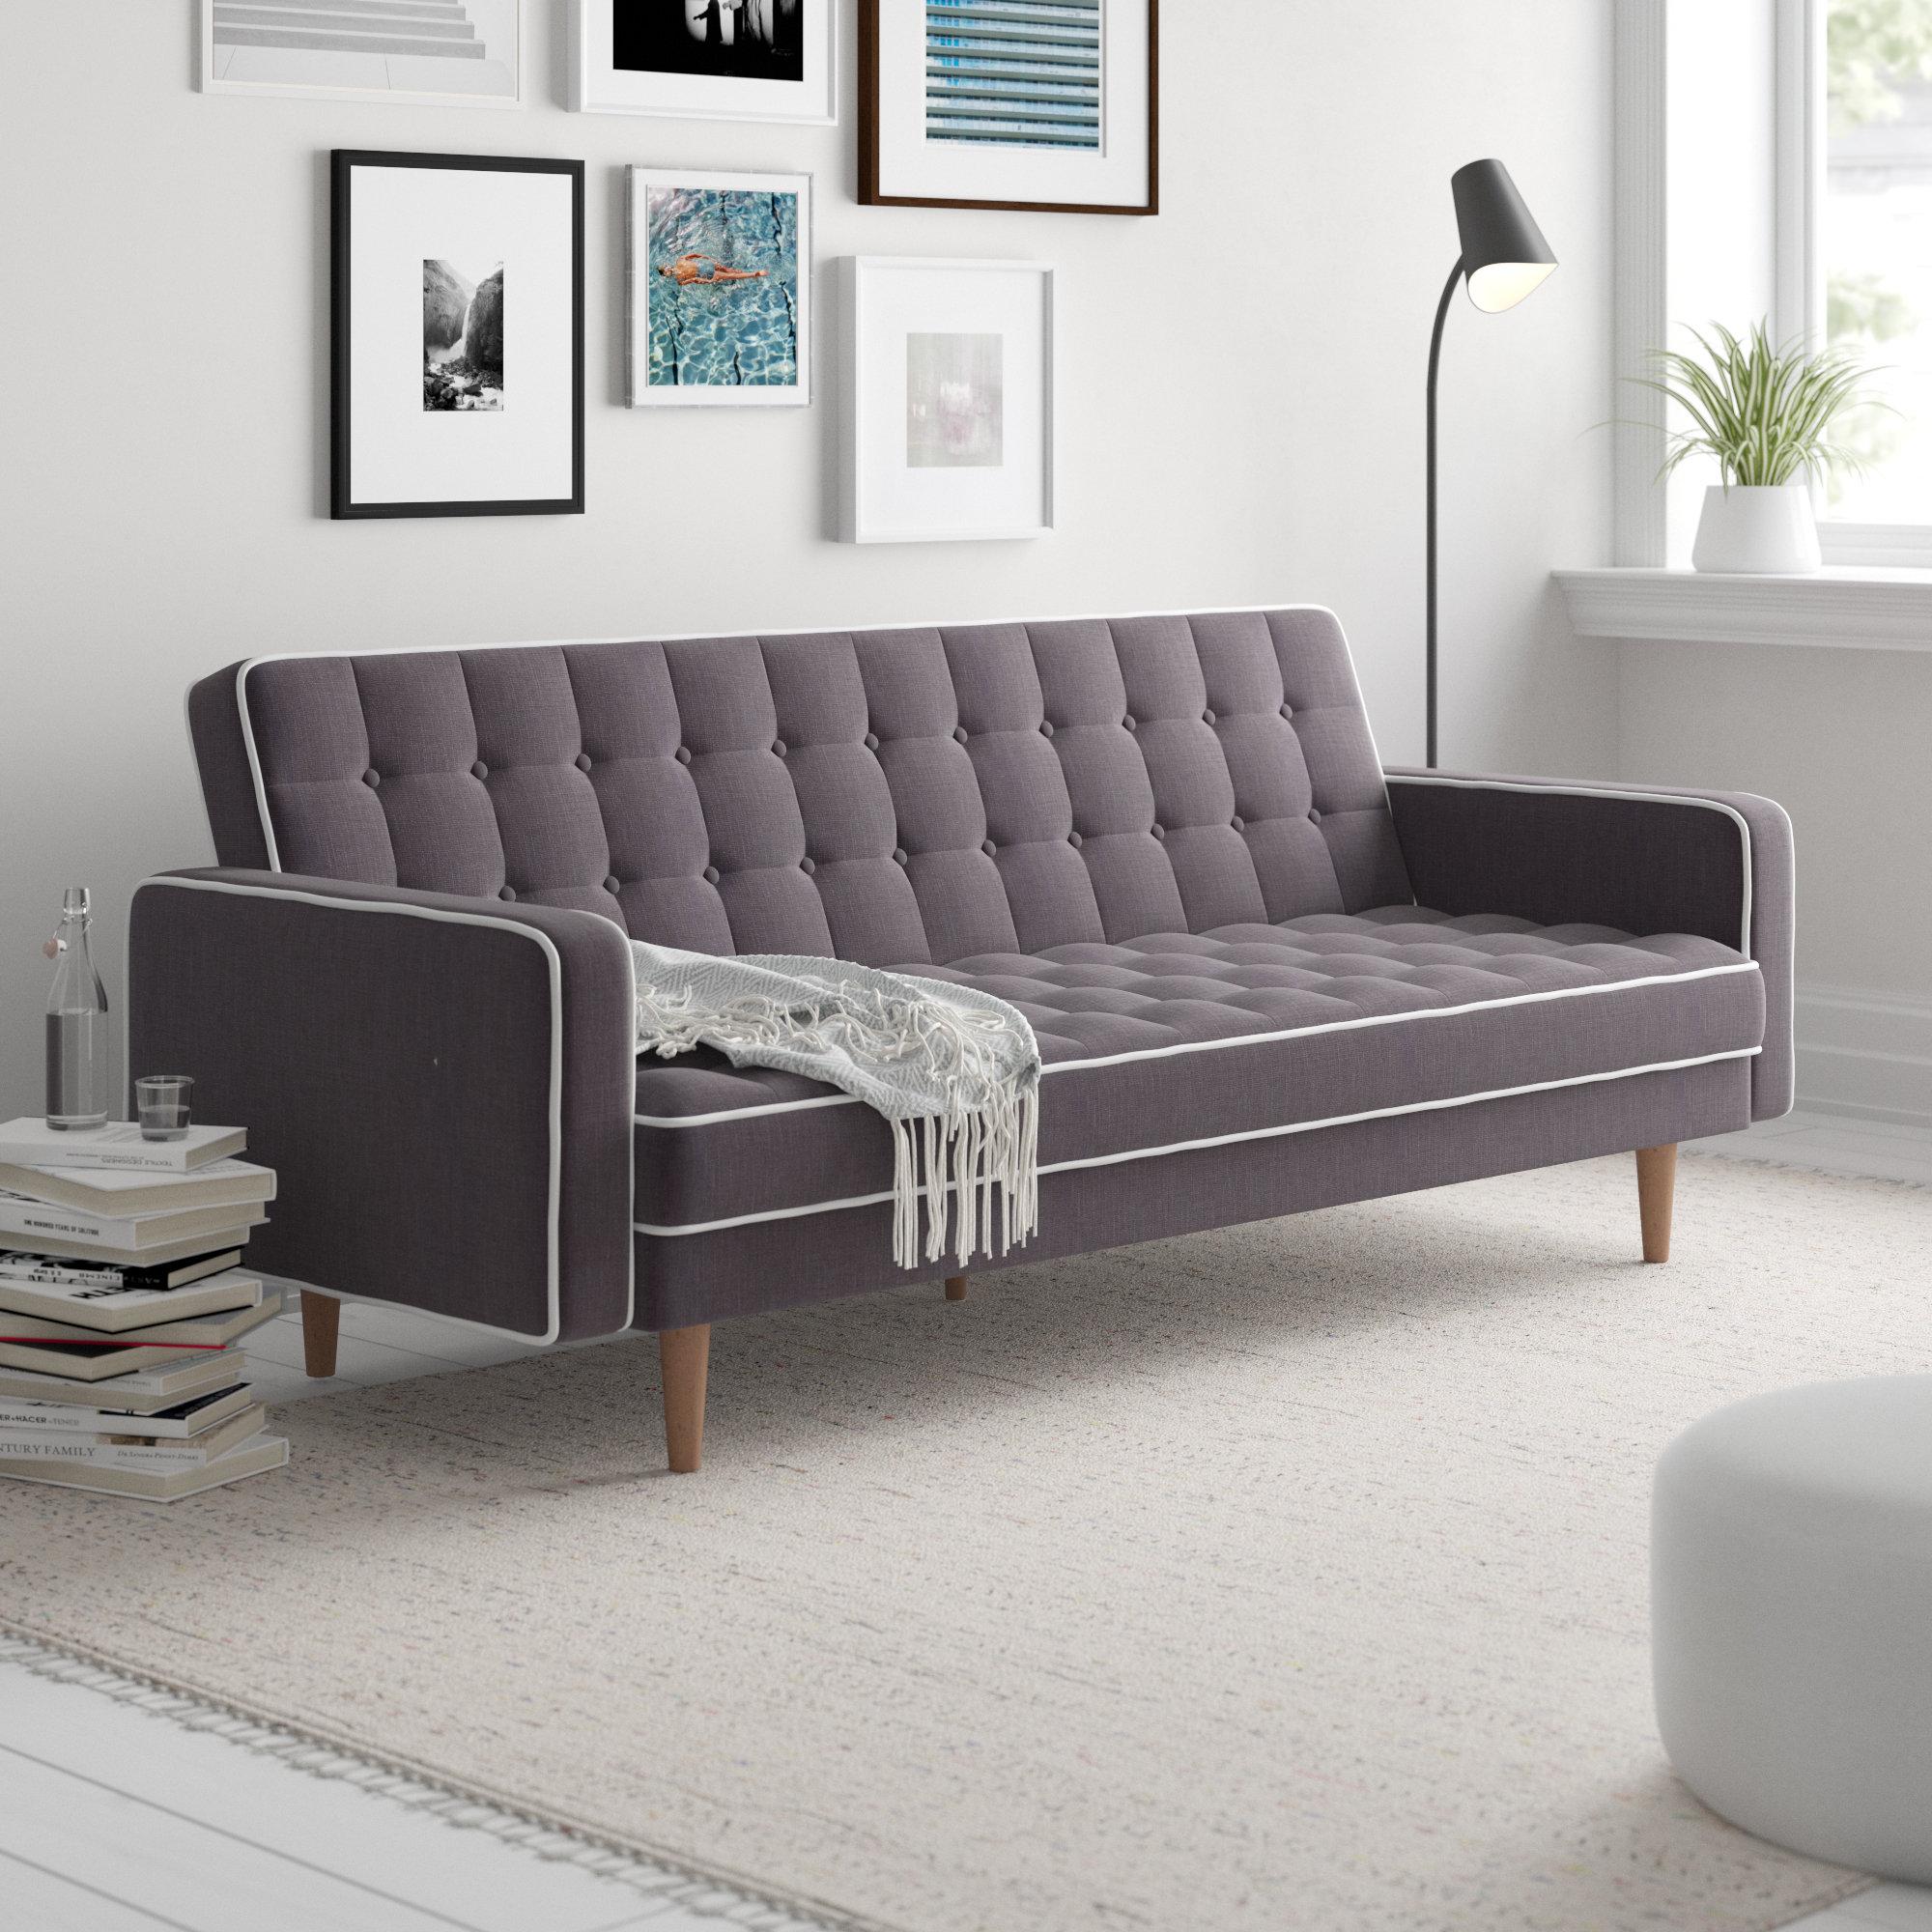 Zipcode Design Noe Mid-Century Modern 2 Tone Convertible Sofa ...